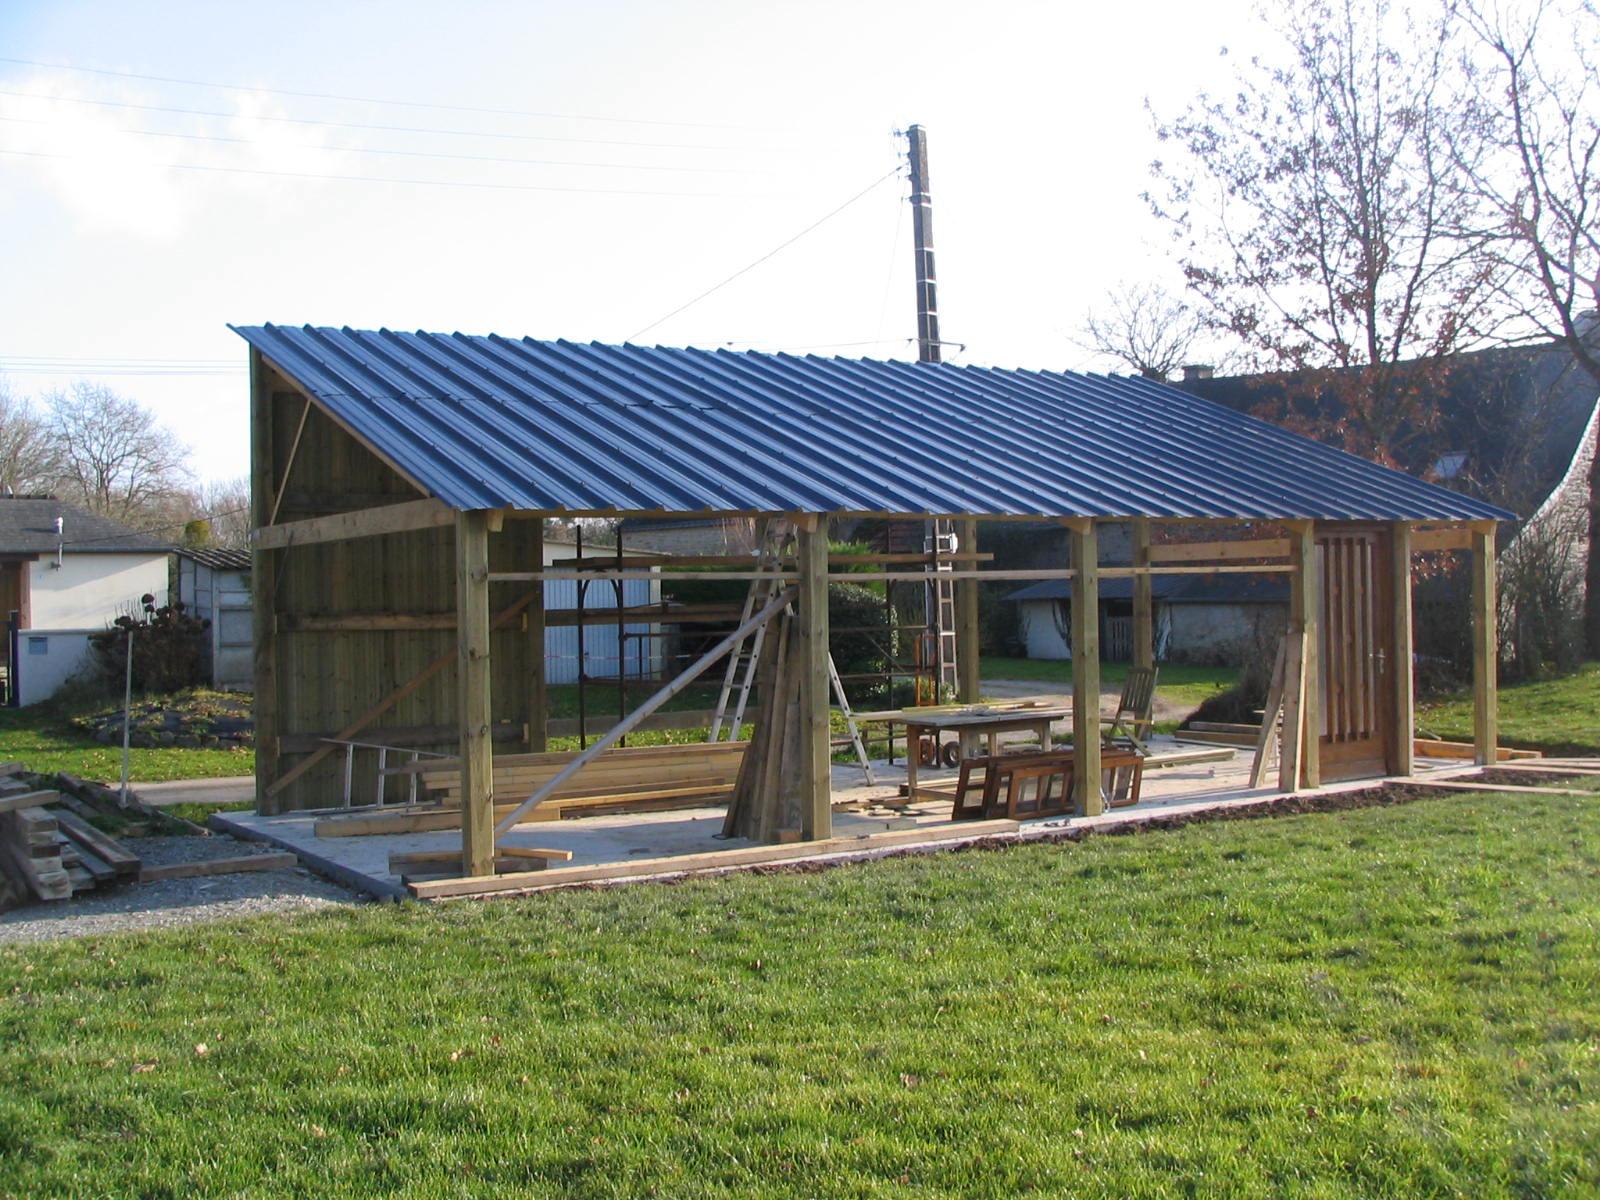 Construire un hangar en bois pas cher for Construction pas cher